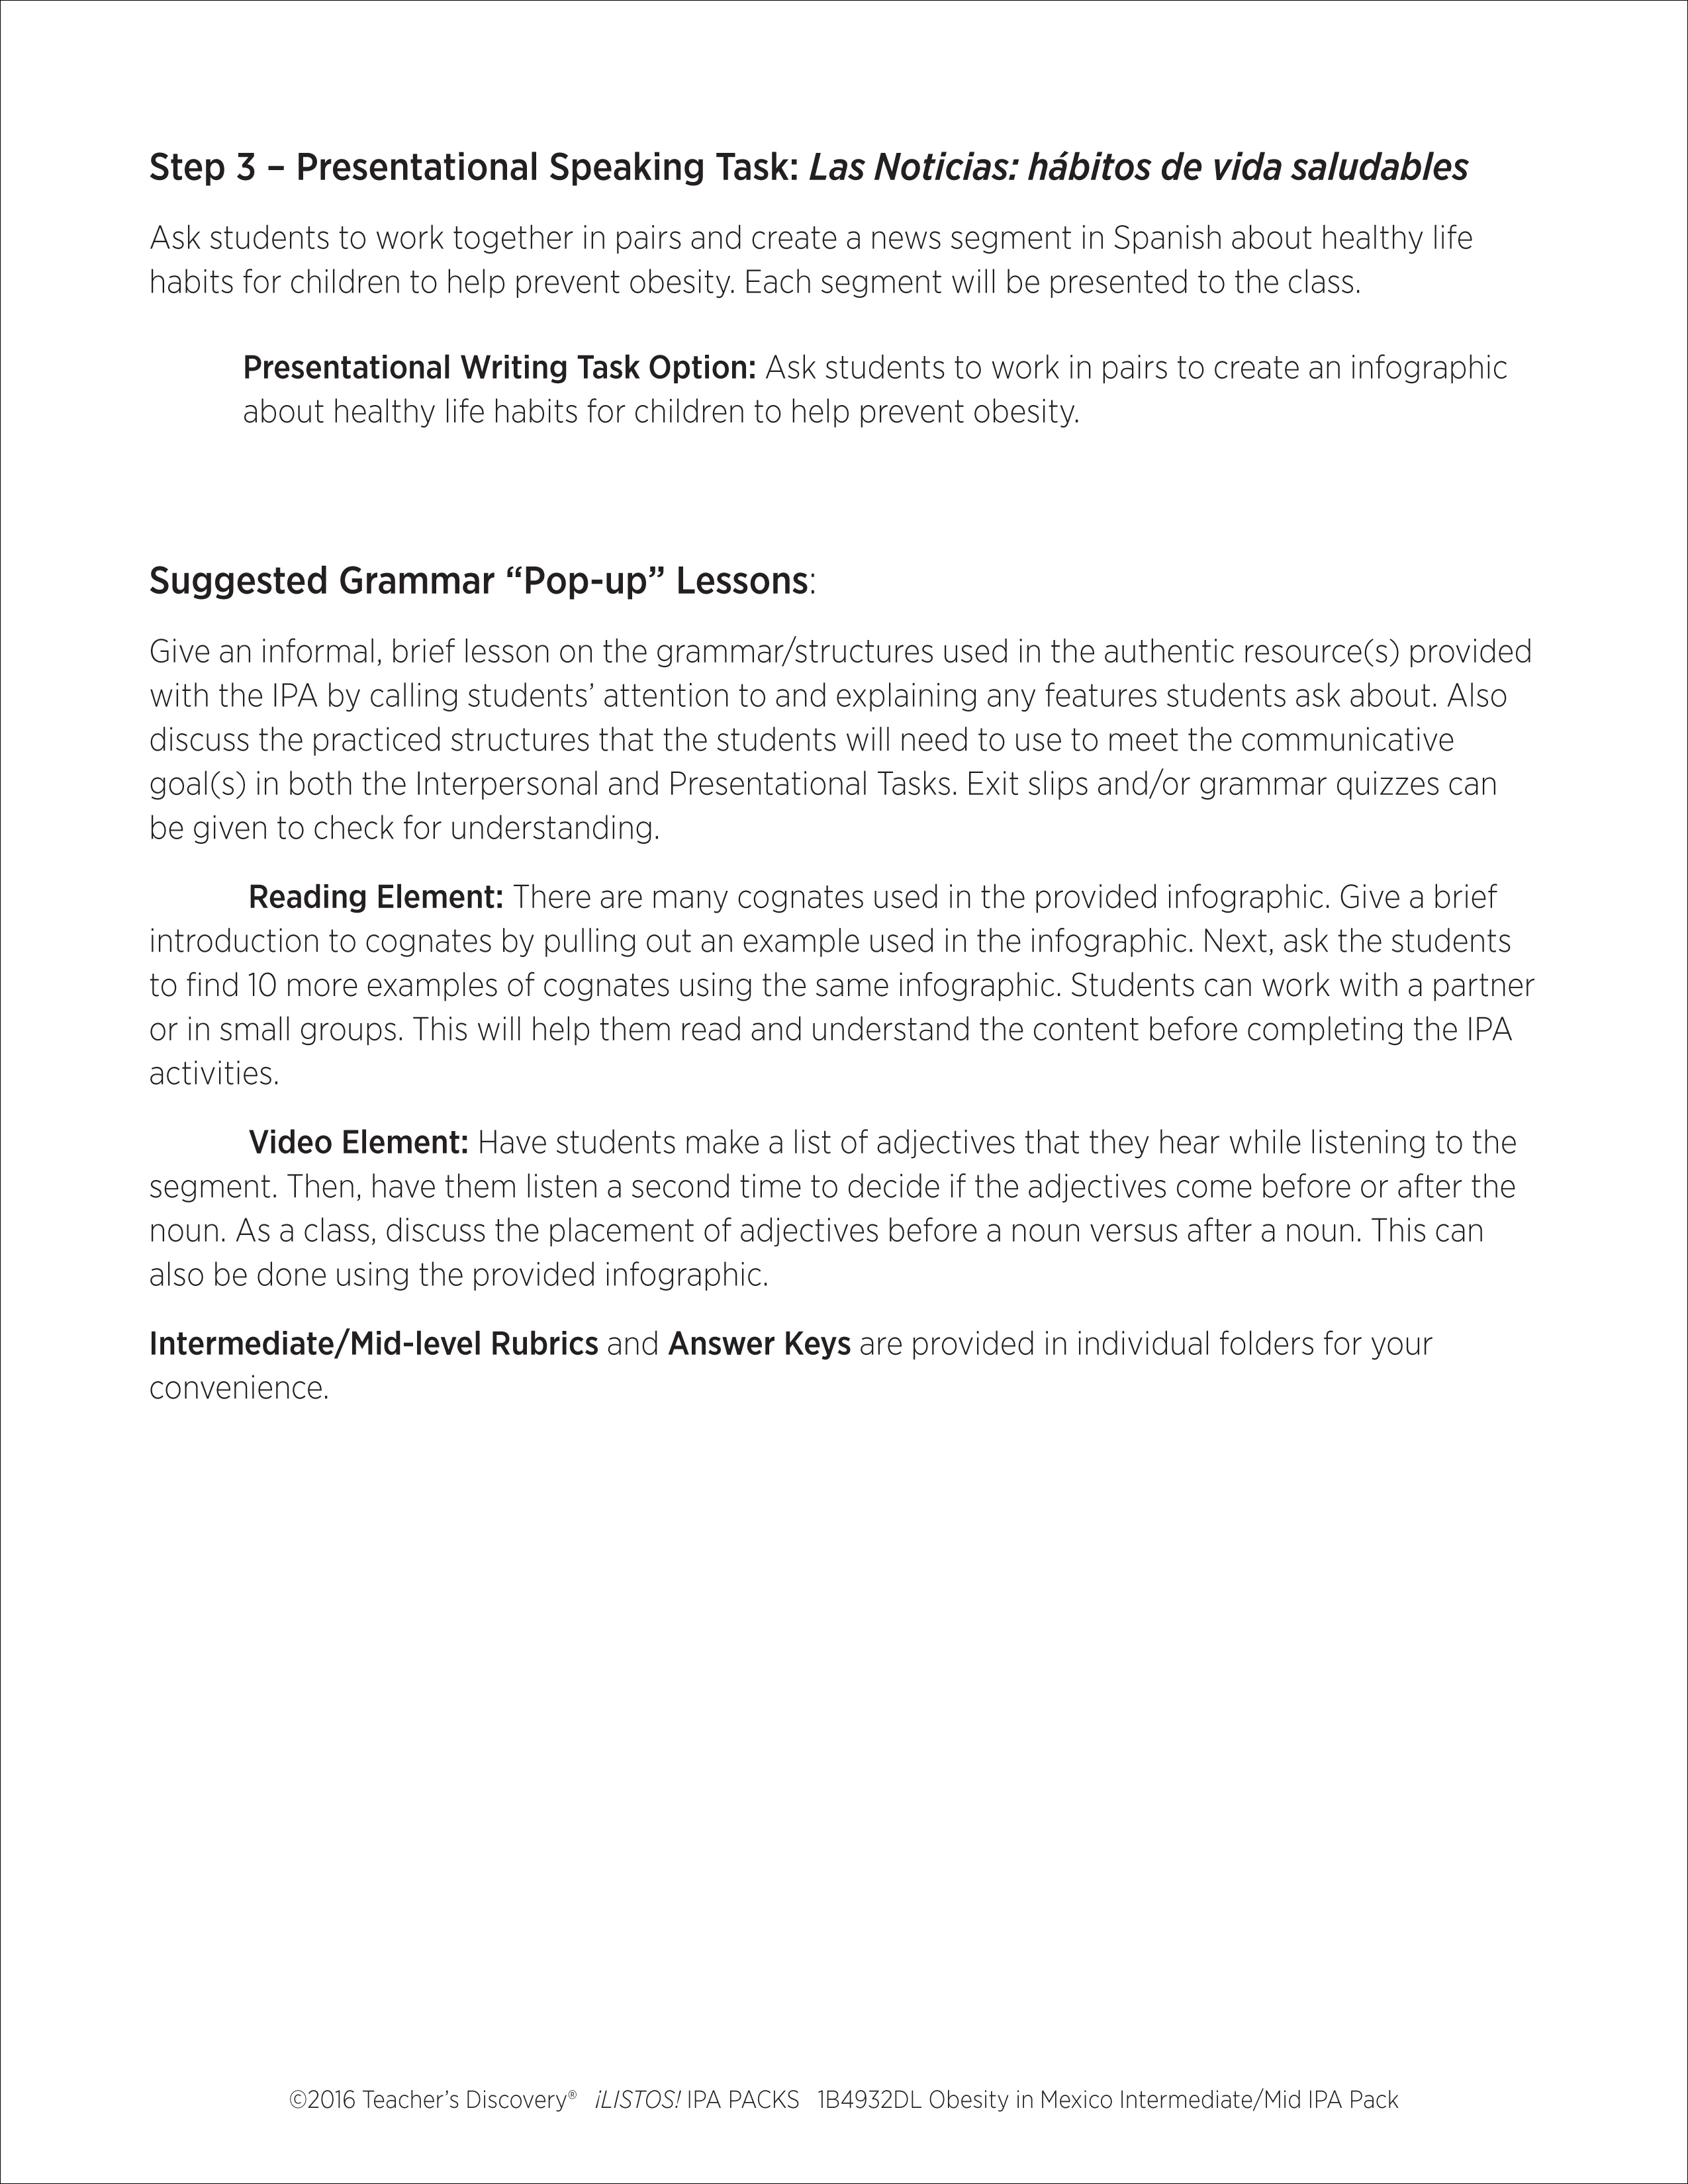 worksheet Spanish Cognates Worksheet obesity in mexico intermediate low spanish ipa pack download enlarge image